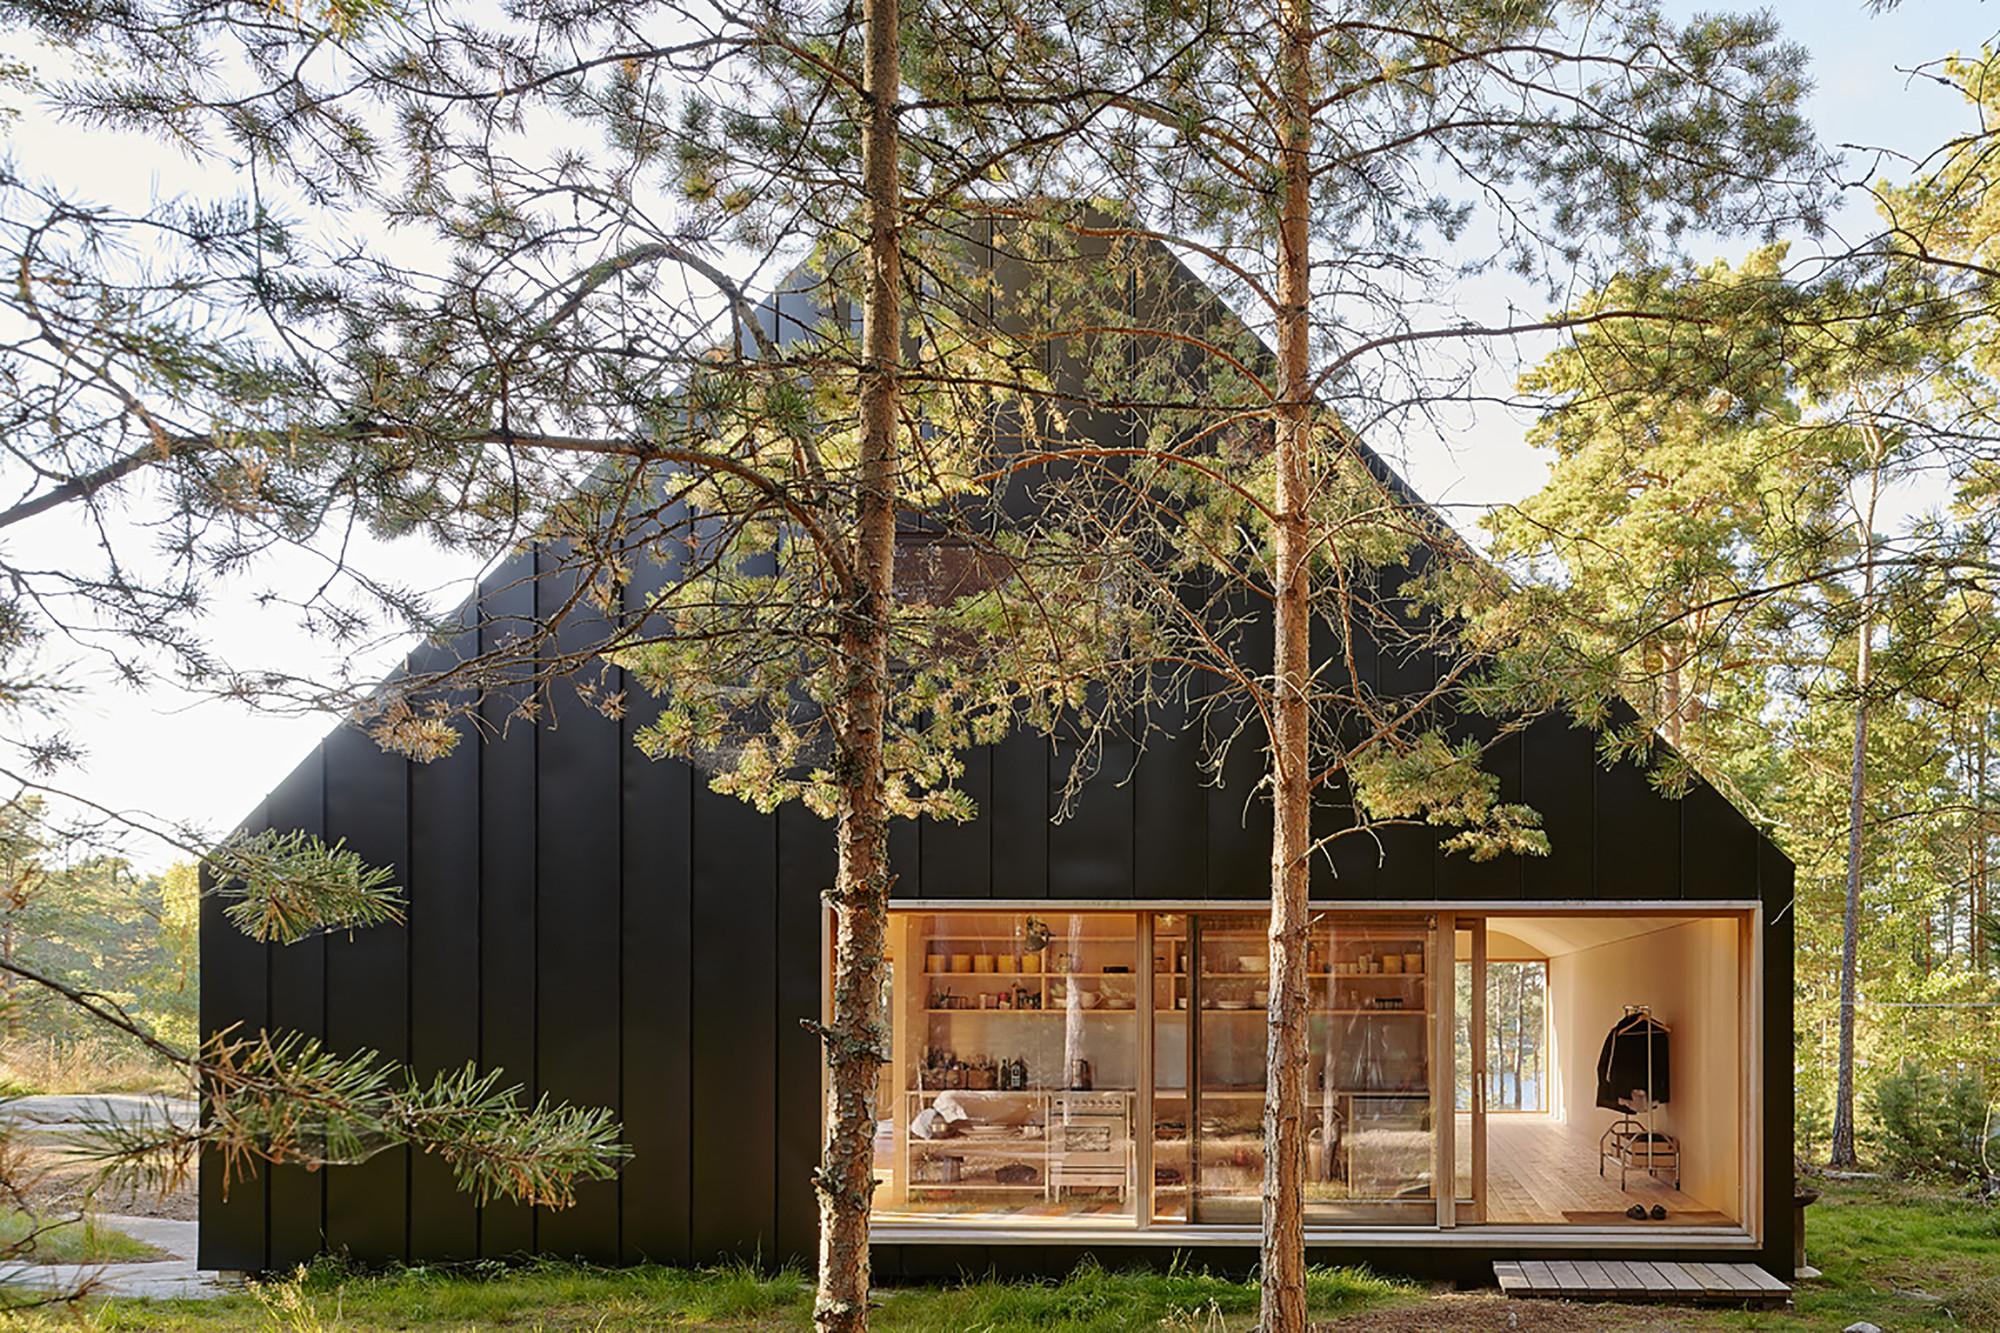 House Husarö  / Tham & Videgård Arkitekter, ©  Ake E:son Lindman